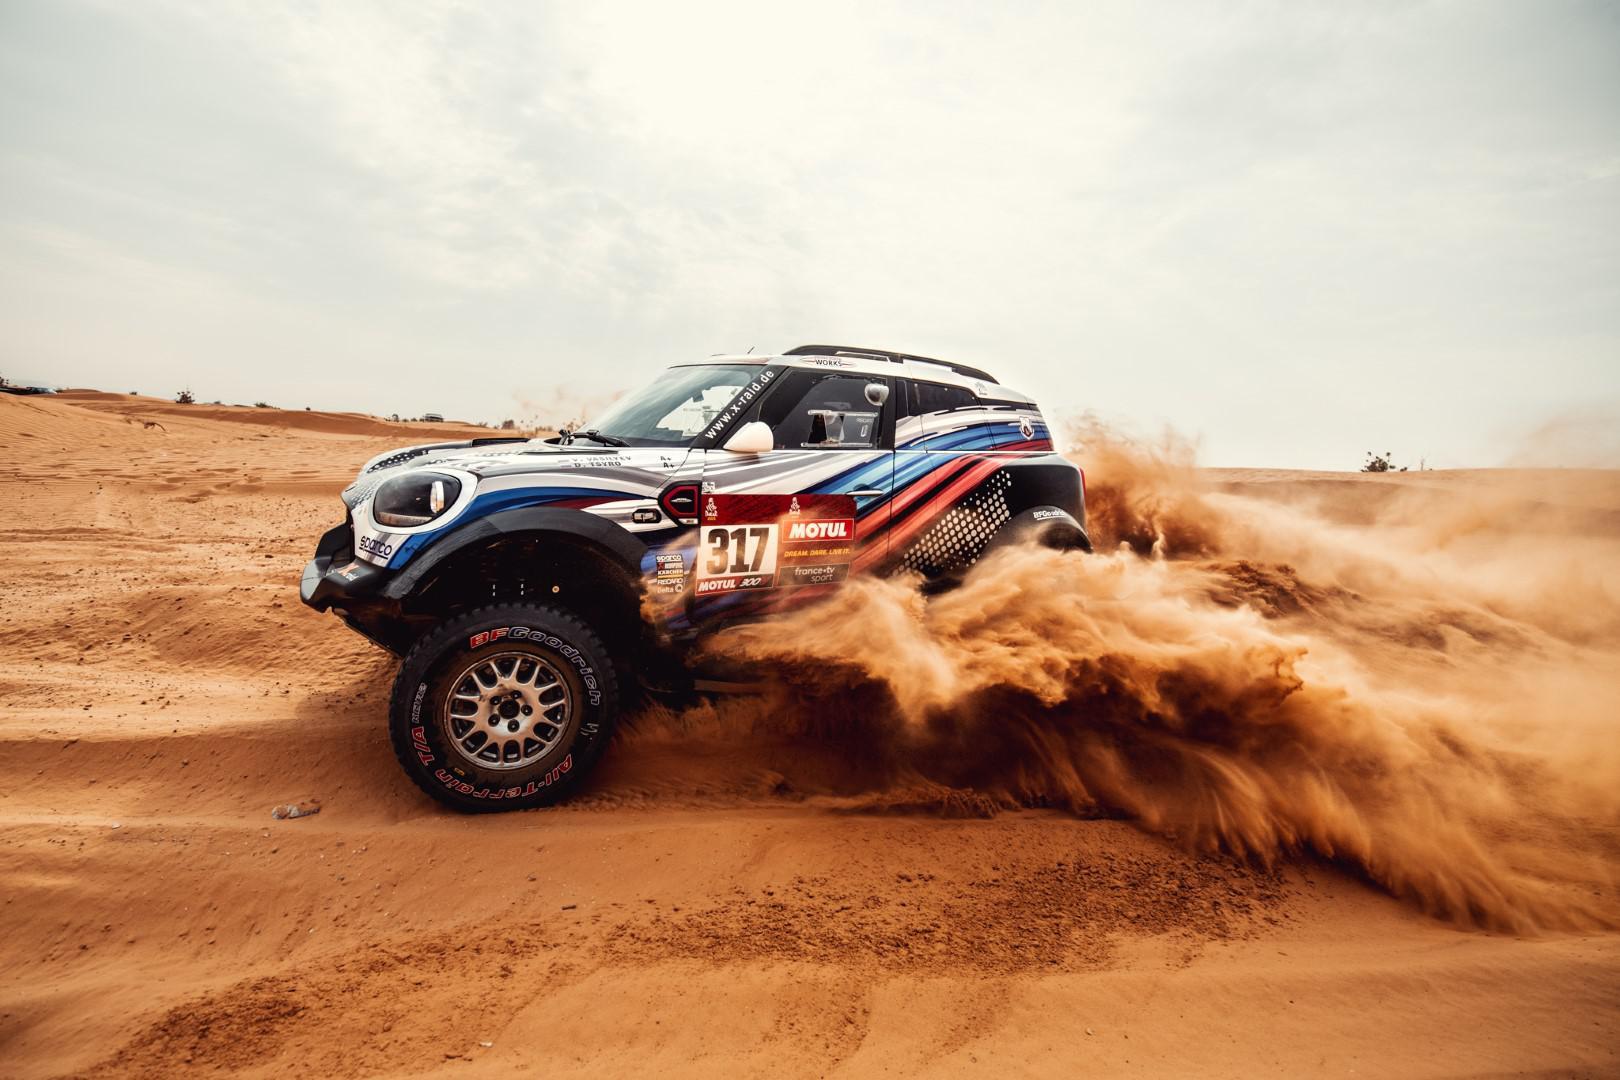 rally-dakar-2021-6eme-victoire-au-general-pour-mini-1416-5.jpg